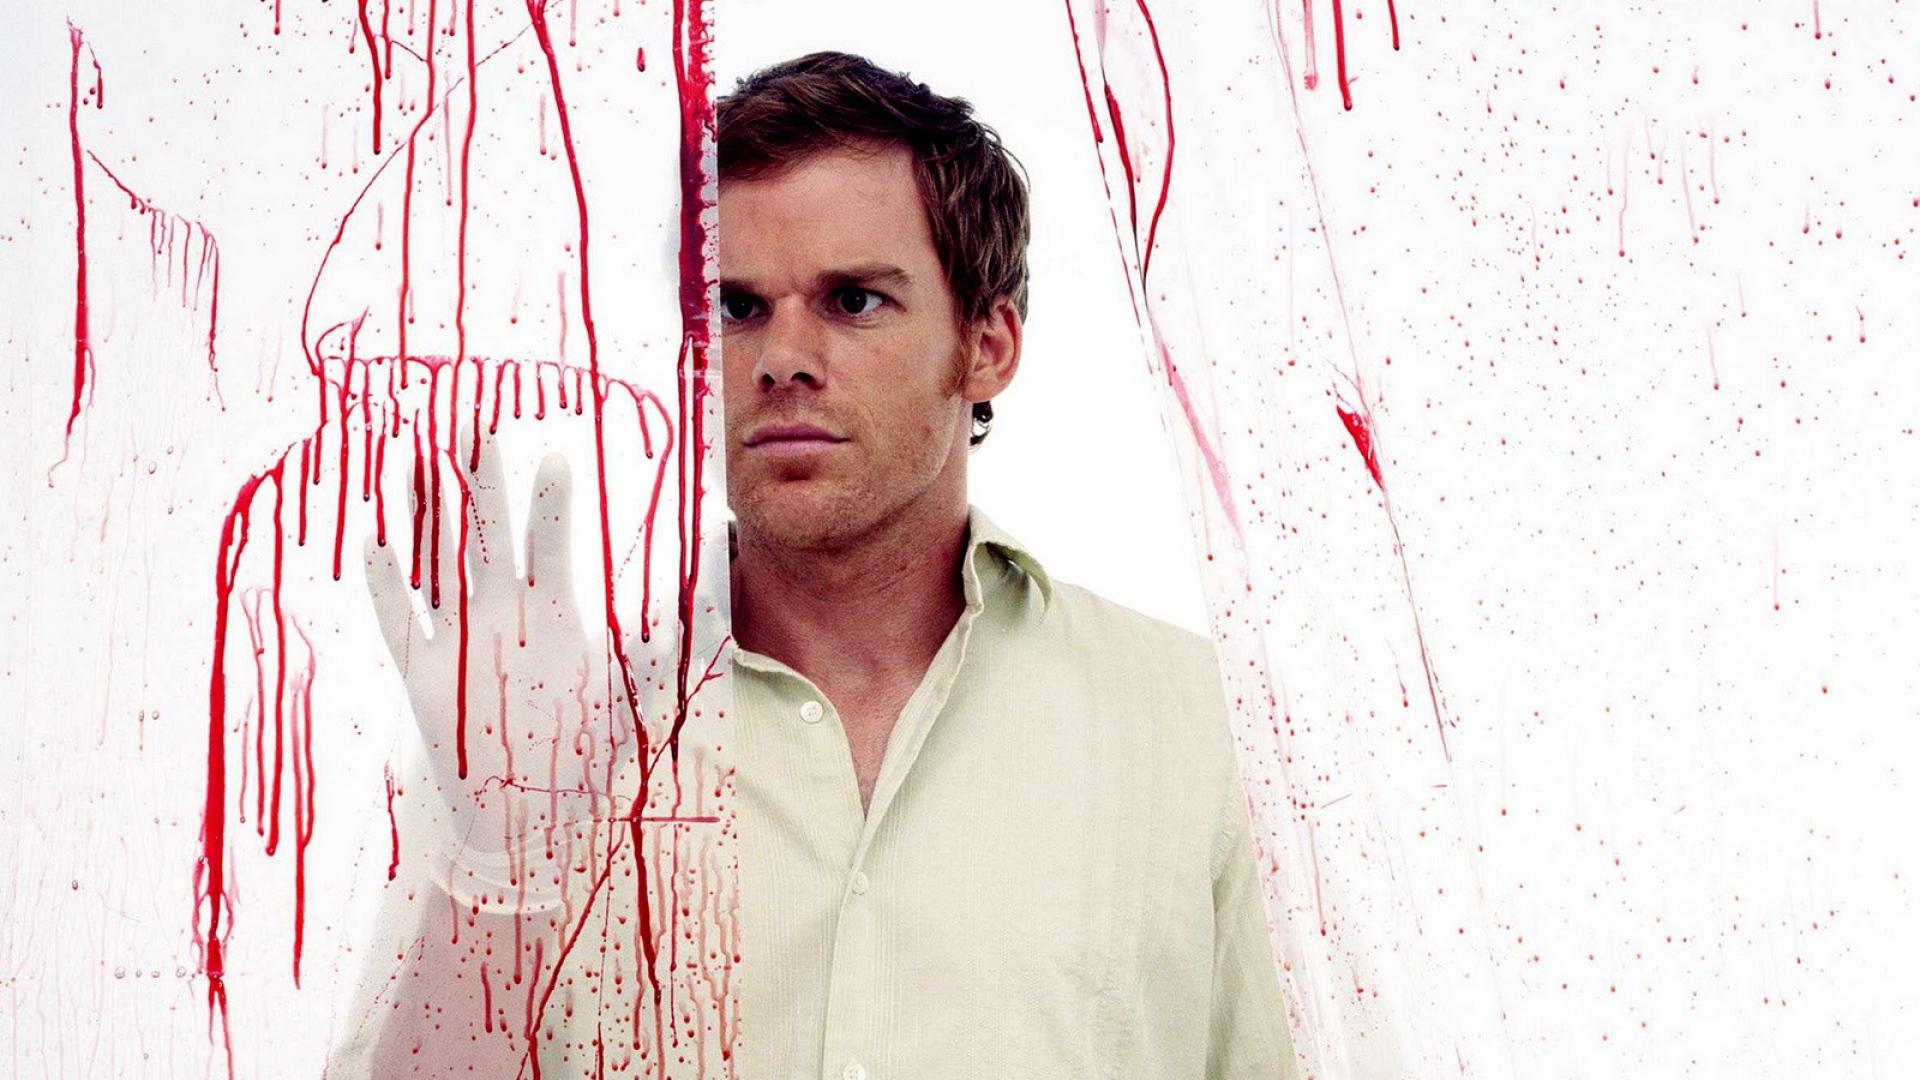 14 Fantastic Hd Dexter Wallpapers Hdwallsource Com